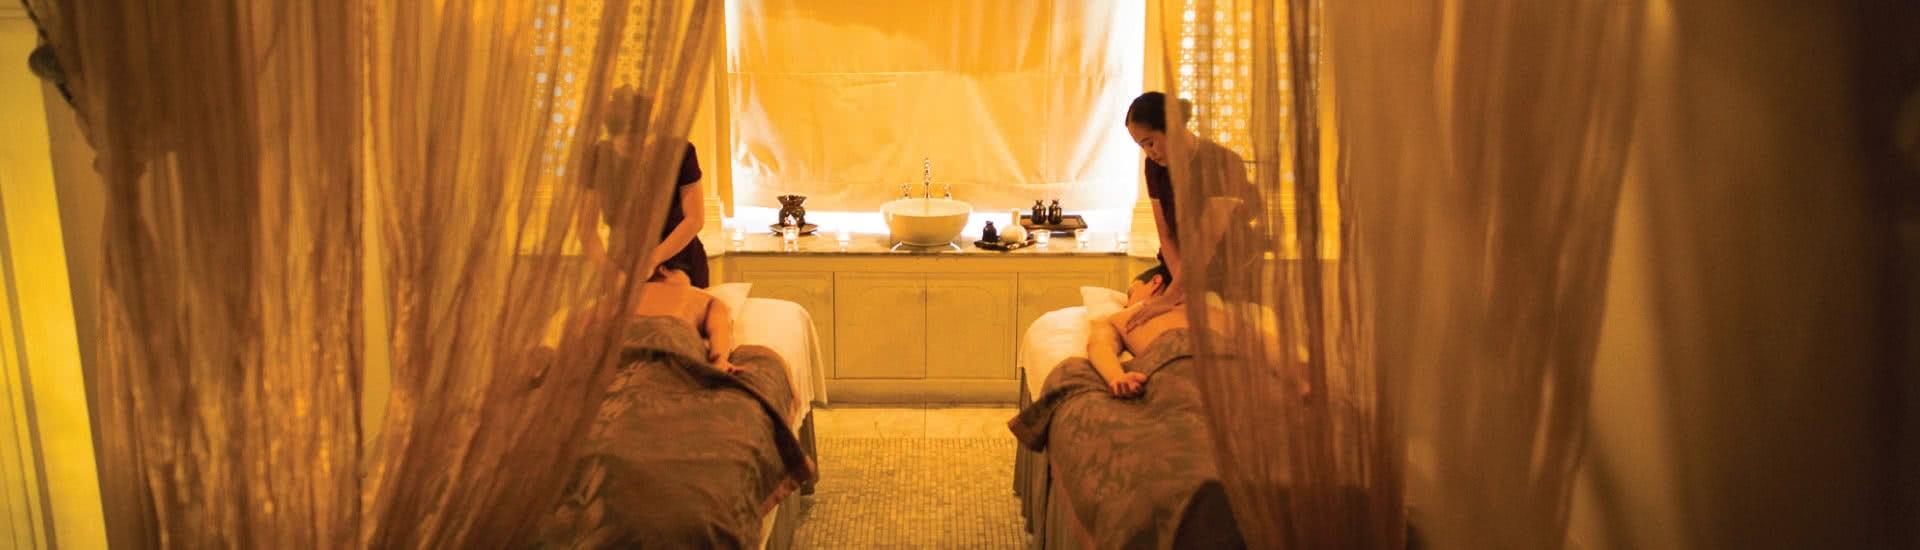 match oslo italian erotic homoseksuell massage